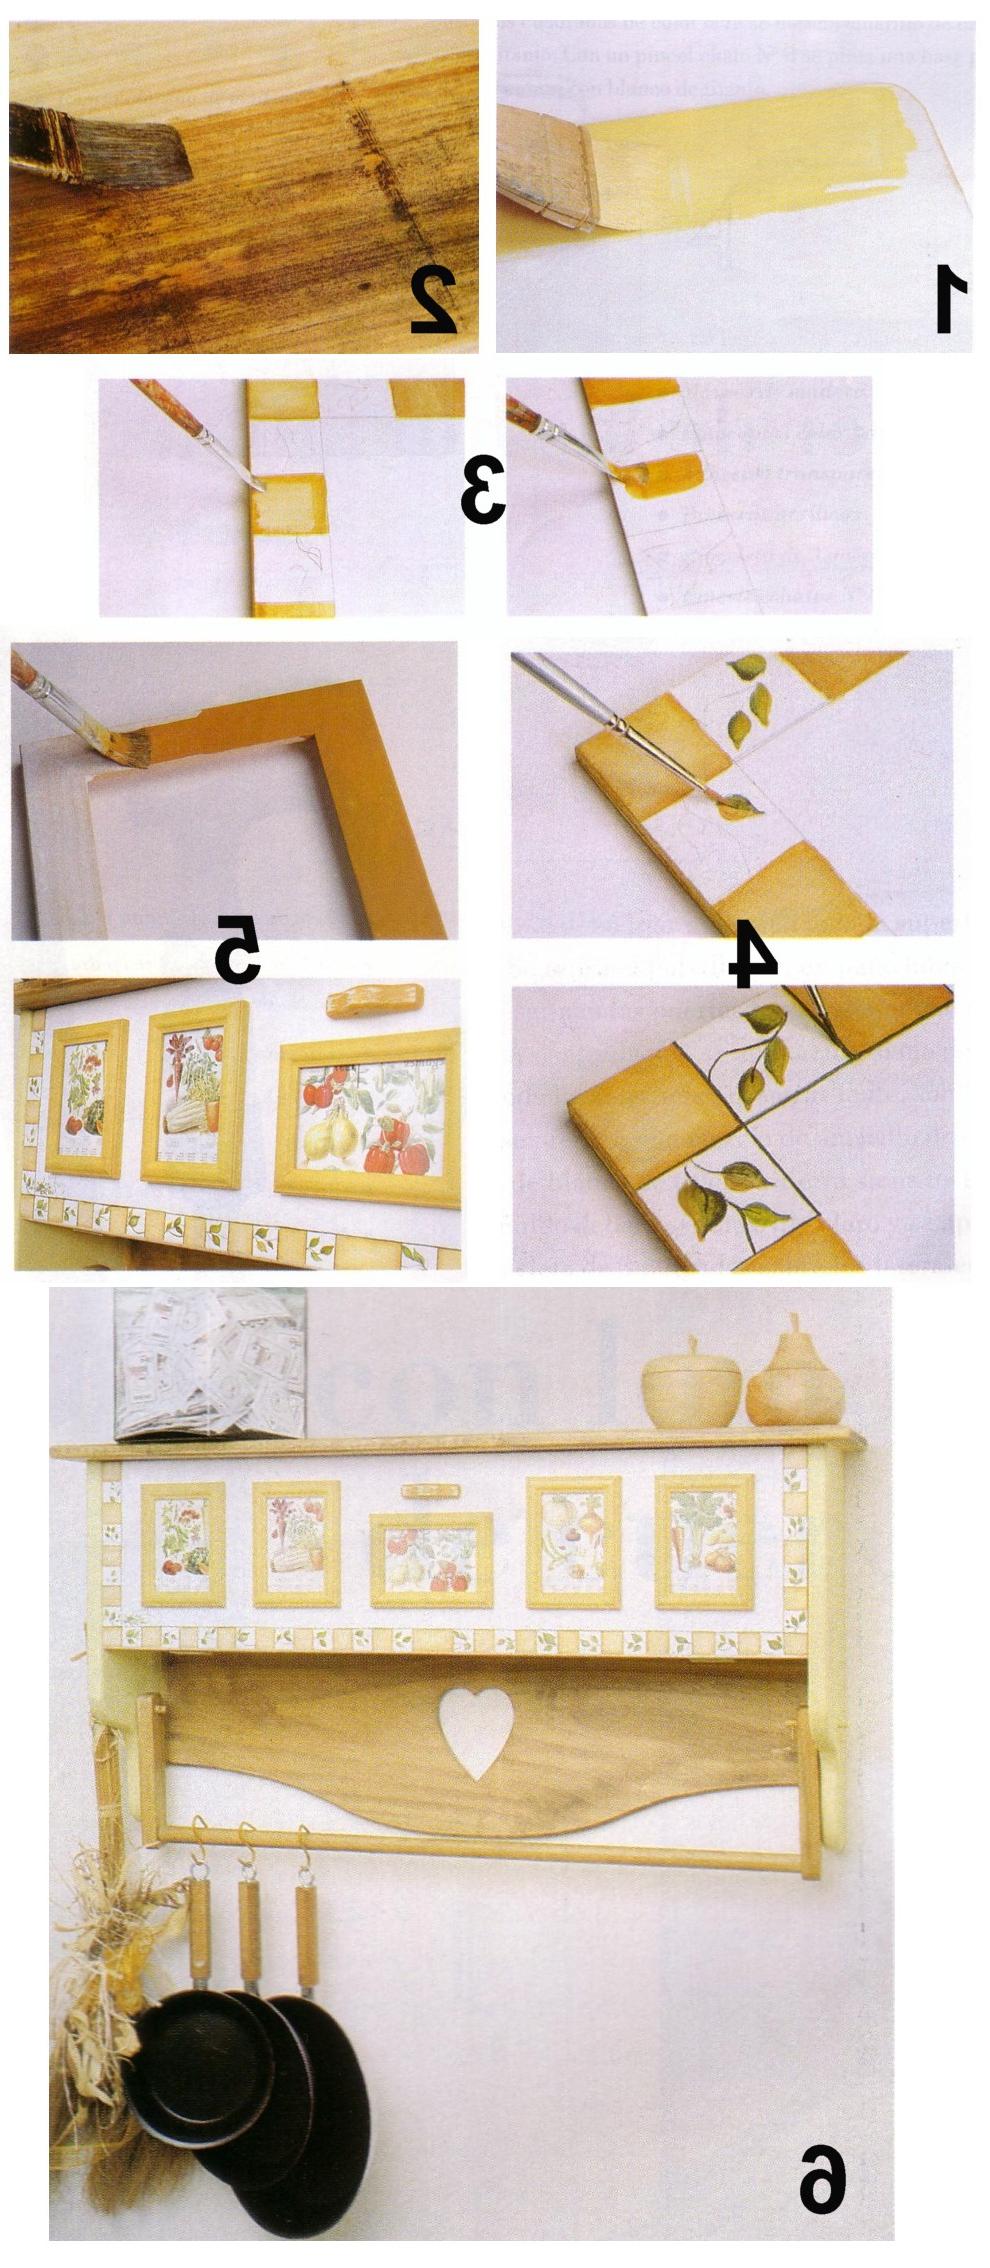 Muebles Manualidades Tldn Bricolaje Hogar Manualidades Cà Mo Trabajar Una Restauracià N